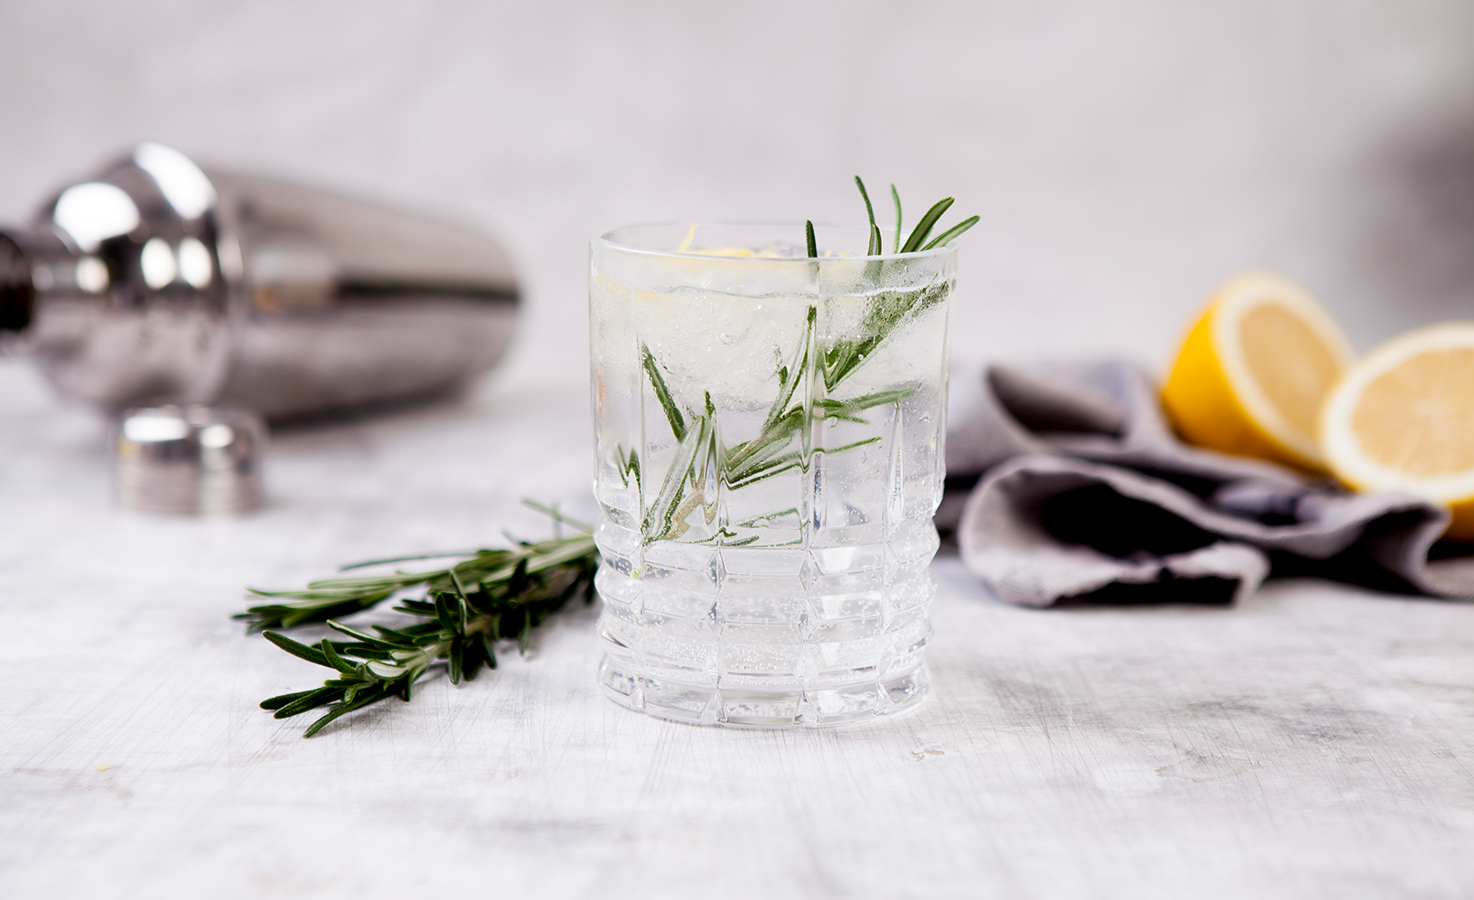 003_Ferdinad-s_Saar_Dry_Gin-_Gin-Tonicu7Lbxluzpqpb5